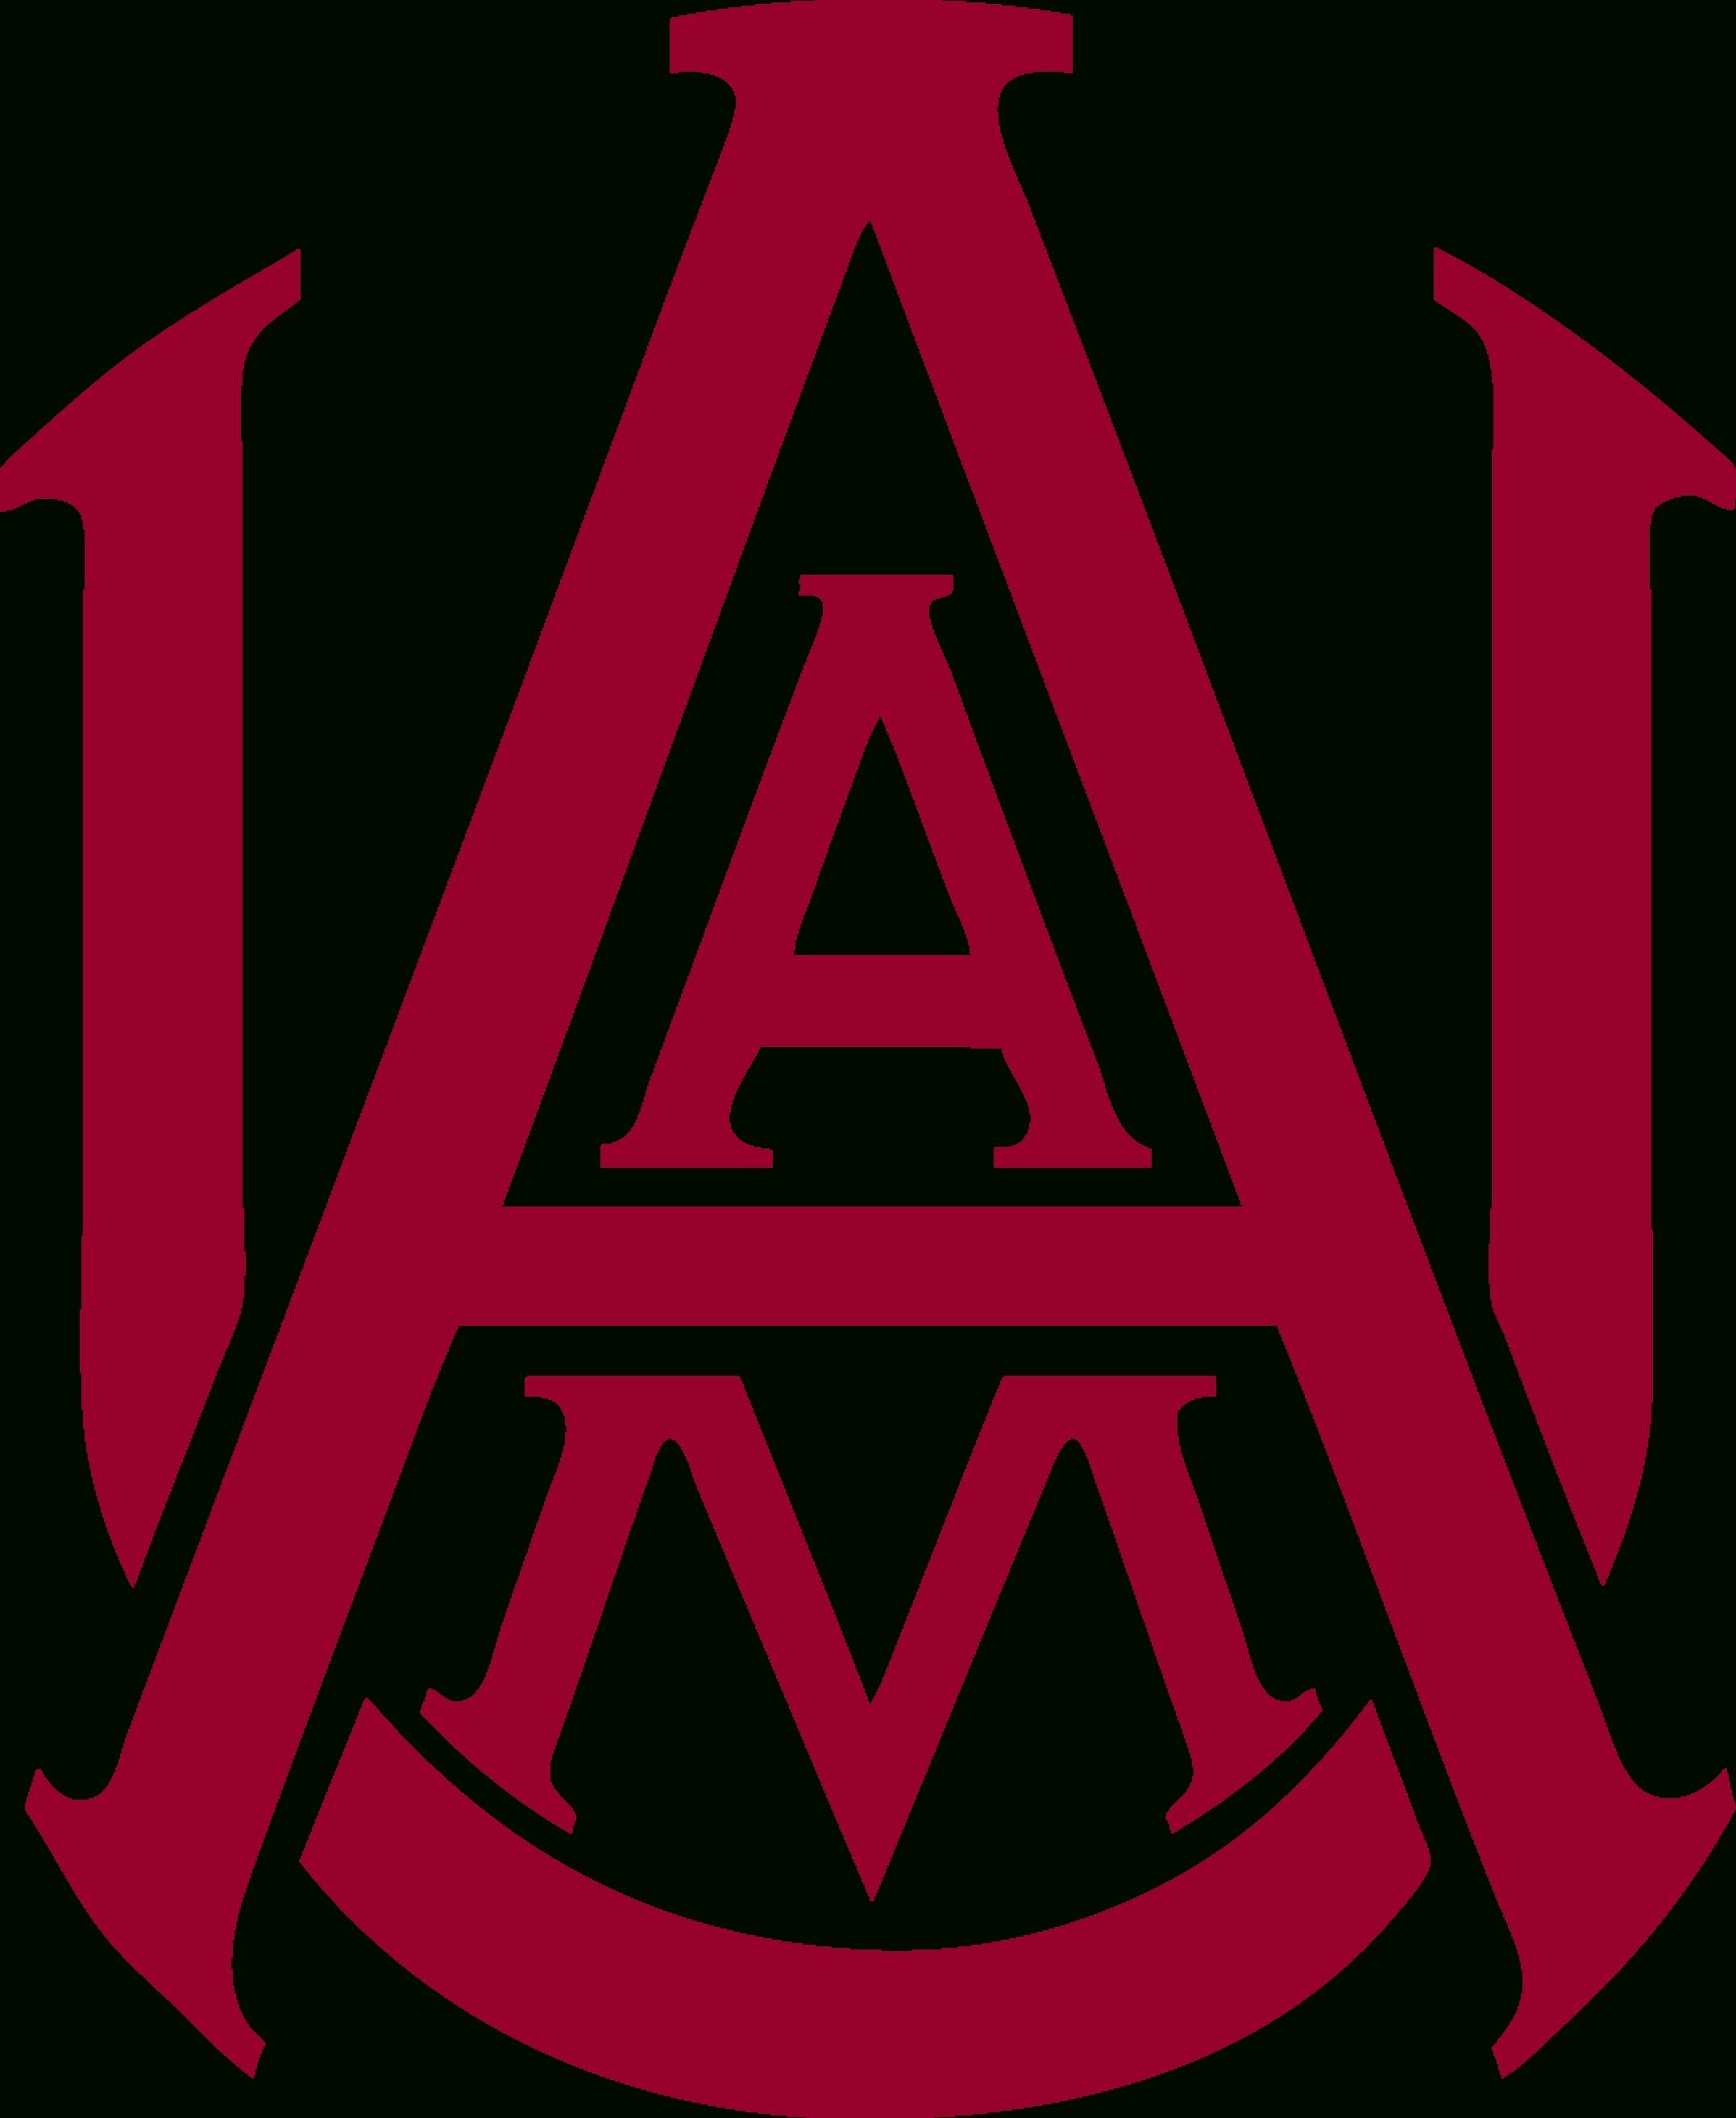 Dashing Alabama A&m School Calendar • Printable Blank Calendar Template Alabama A&m Calendar 2019